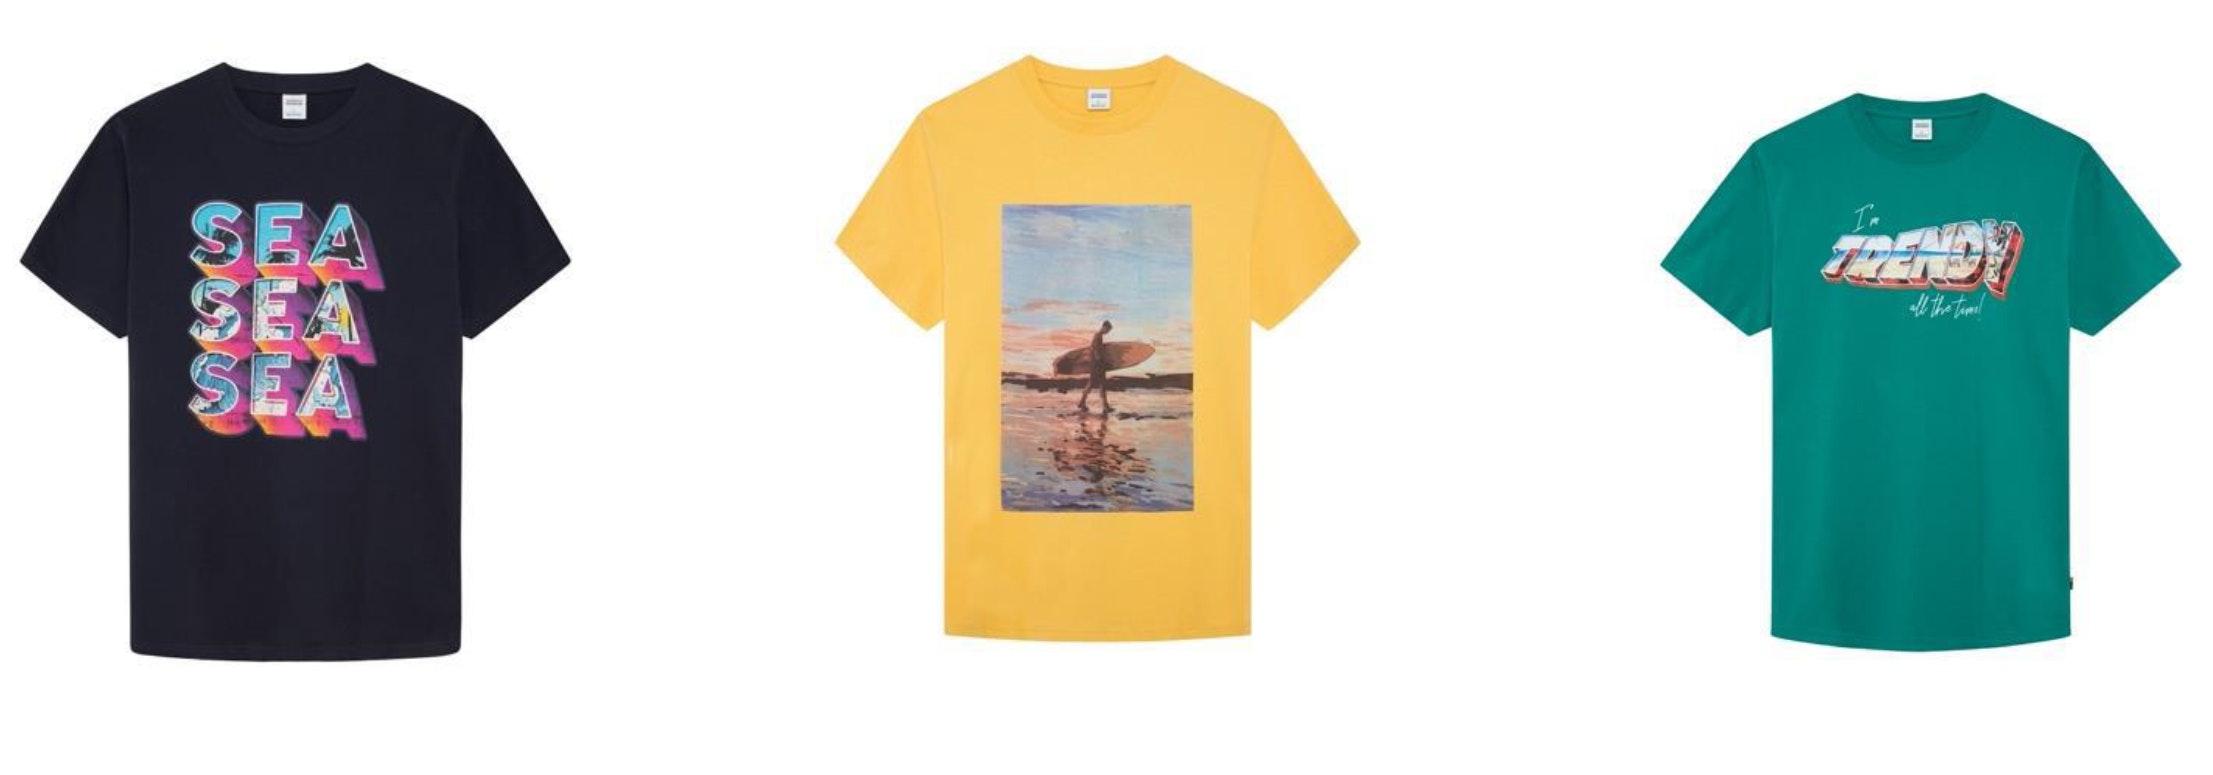 t-shirts retro Springfield